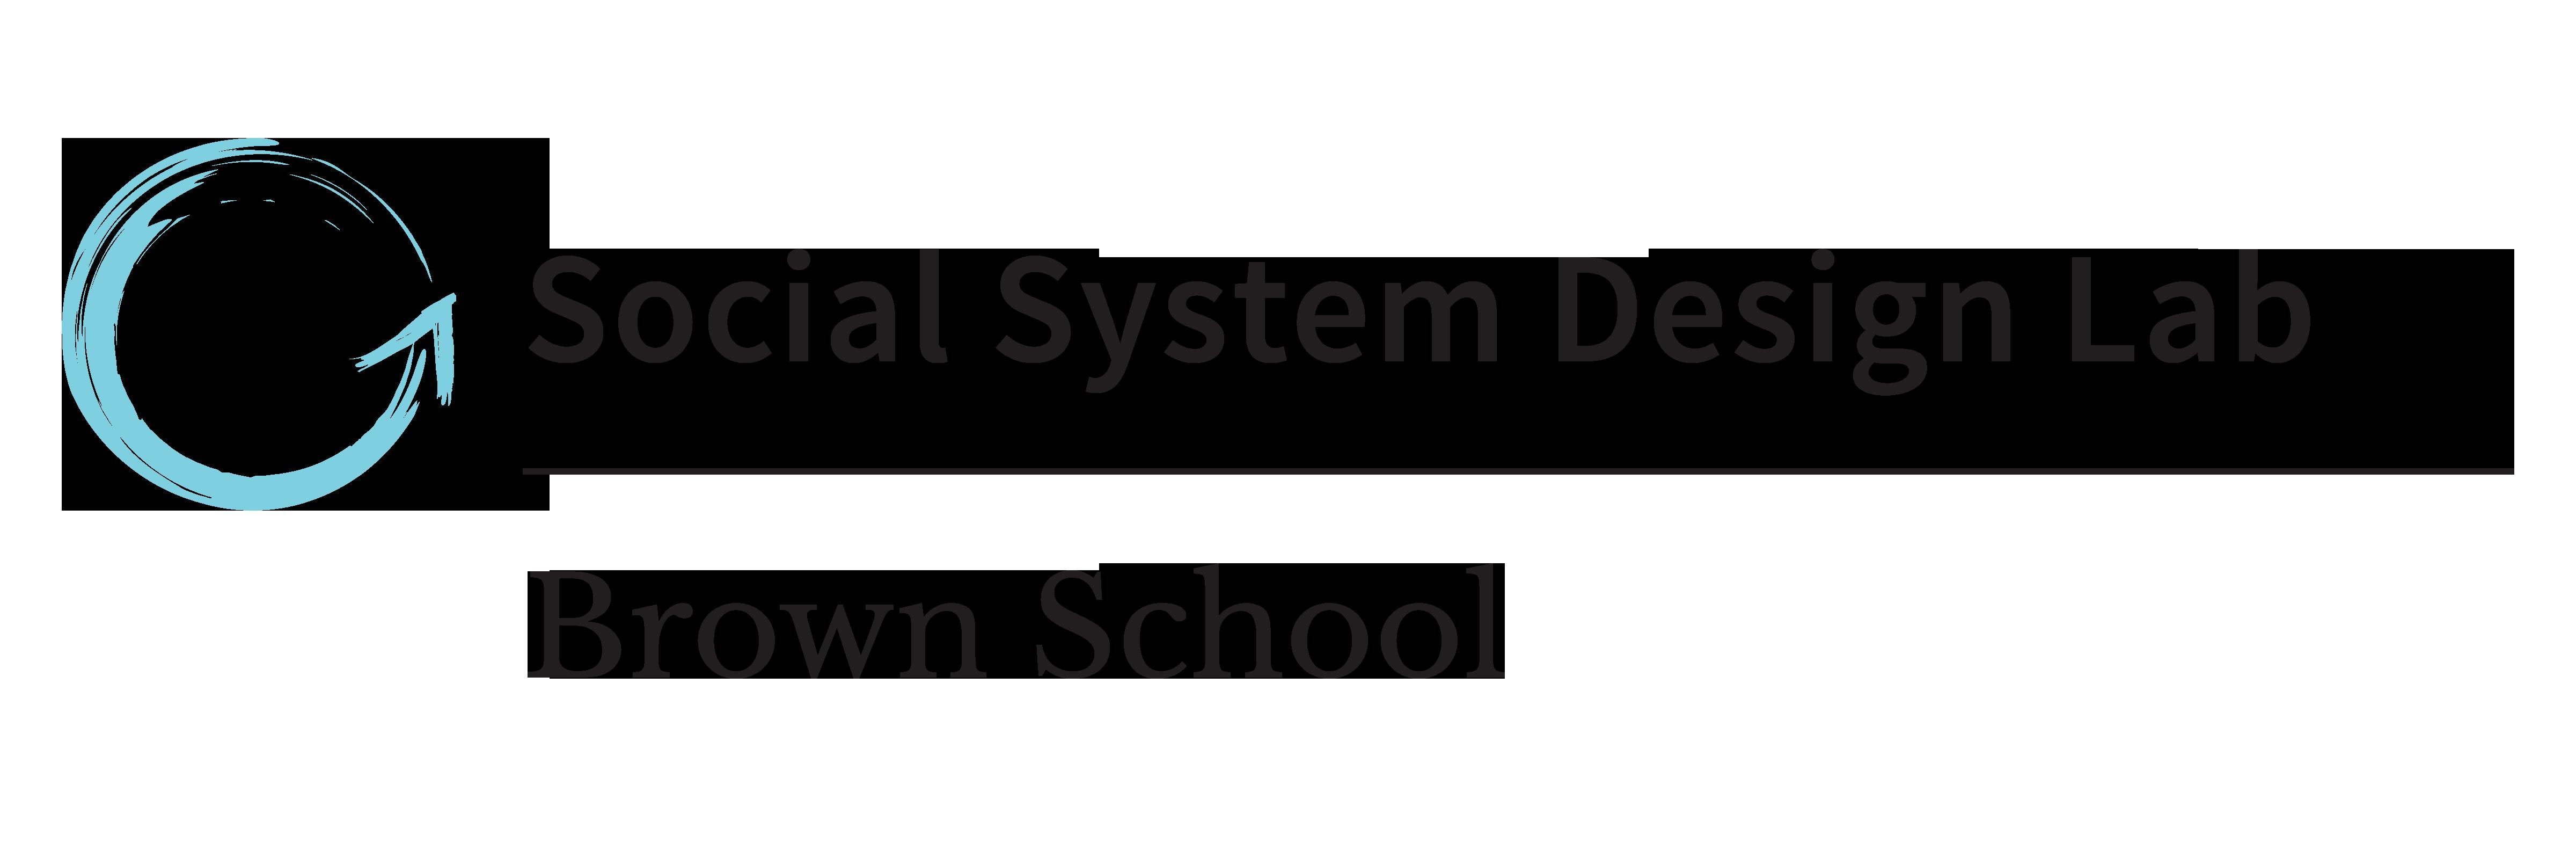 Social System Design Lab